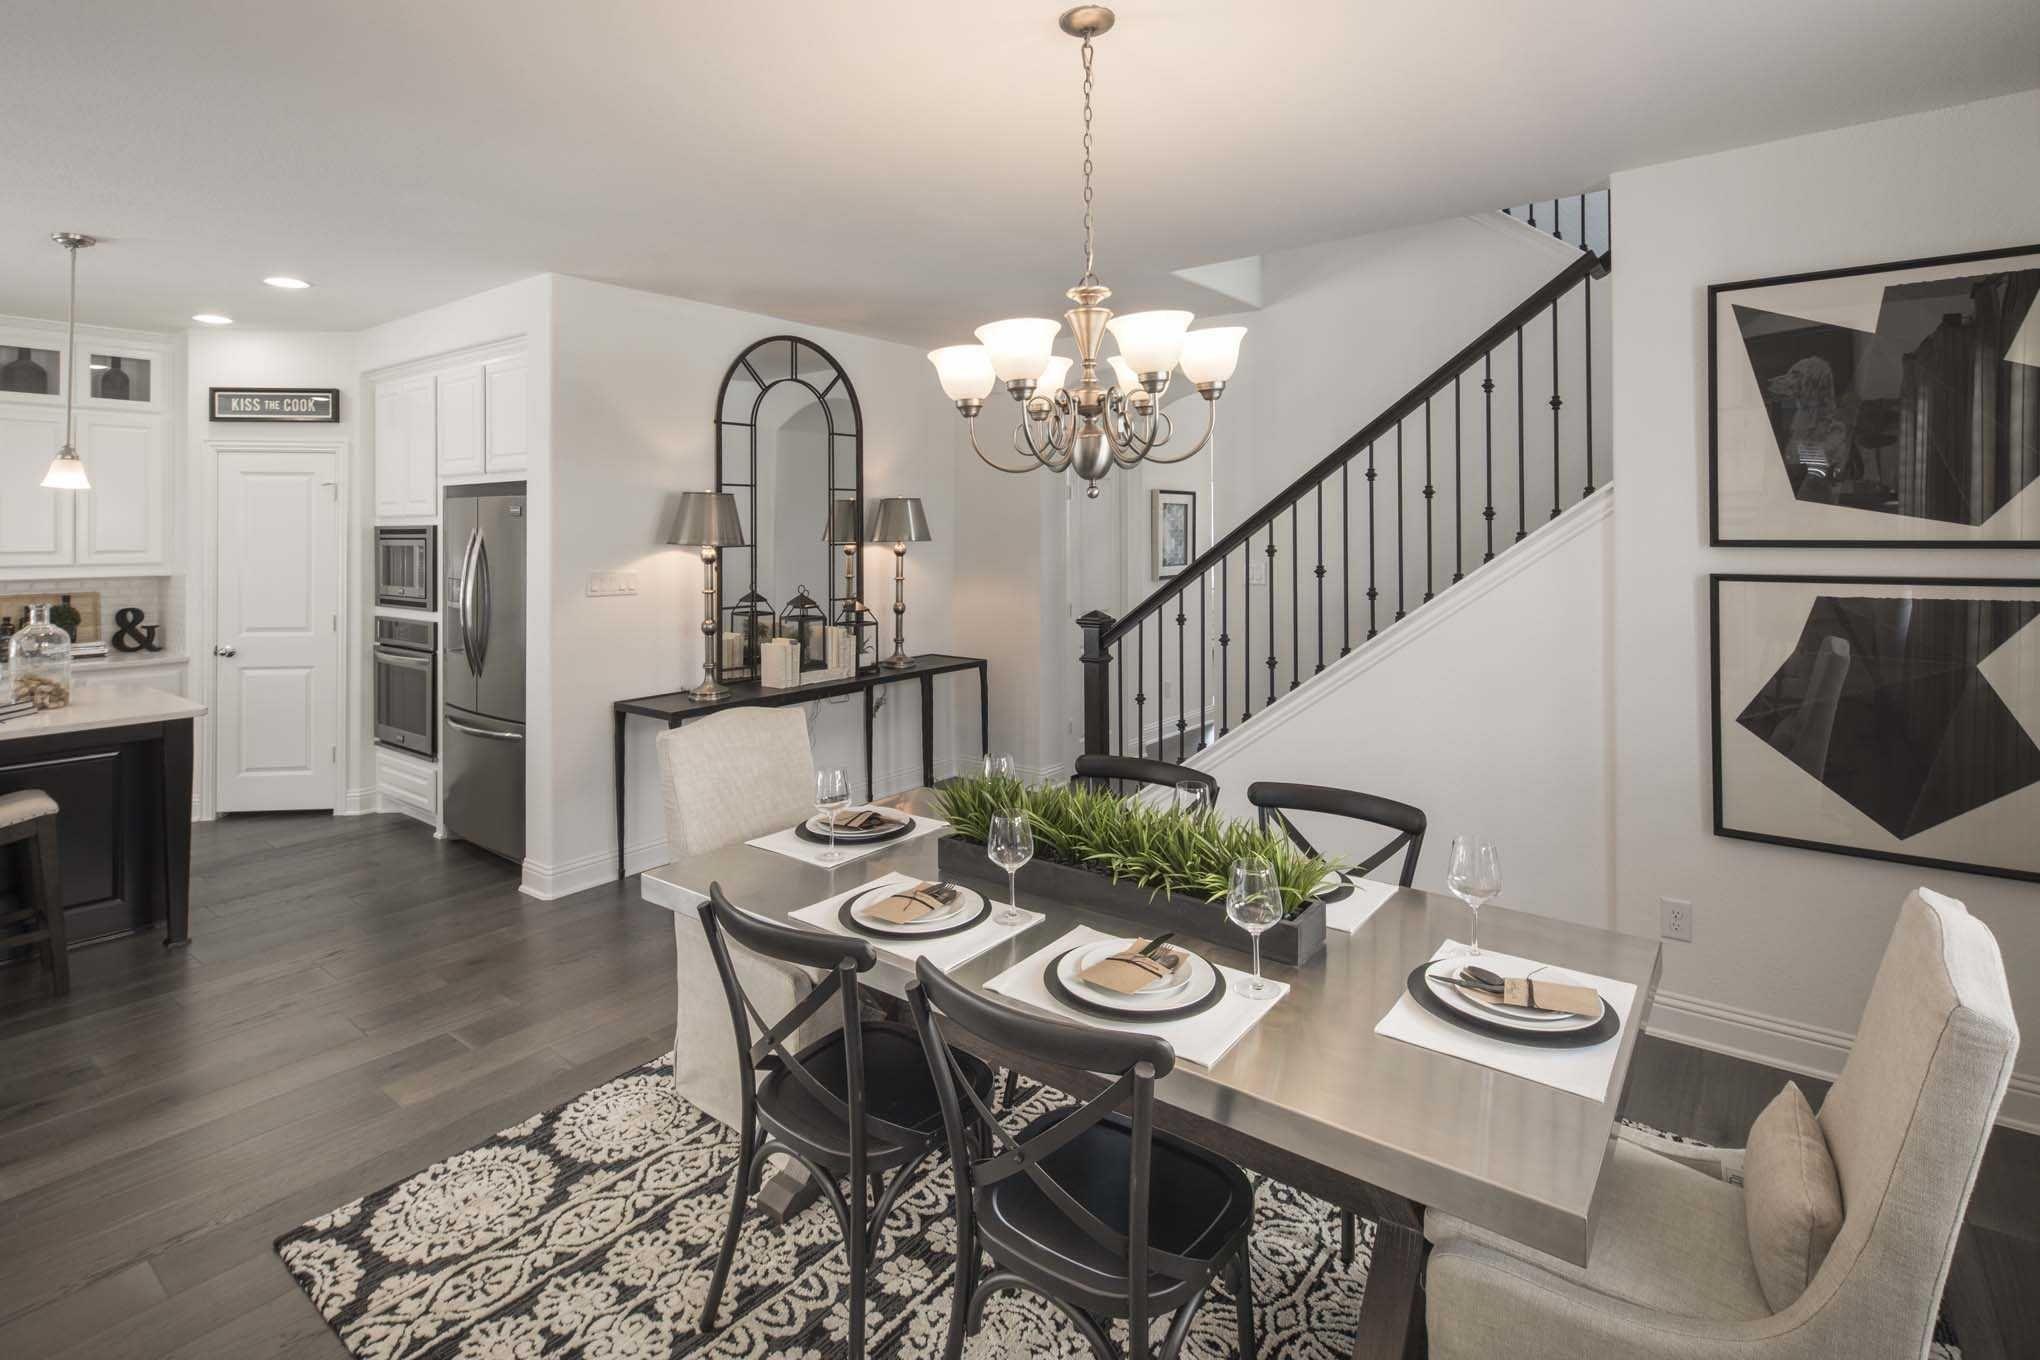 highland homes plan 306 model home in dallas fort worth texas rh pinterest ca